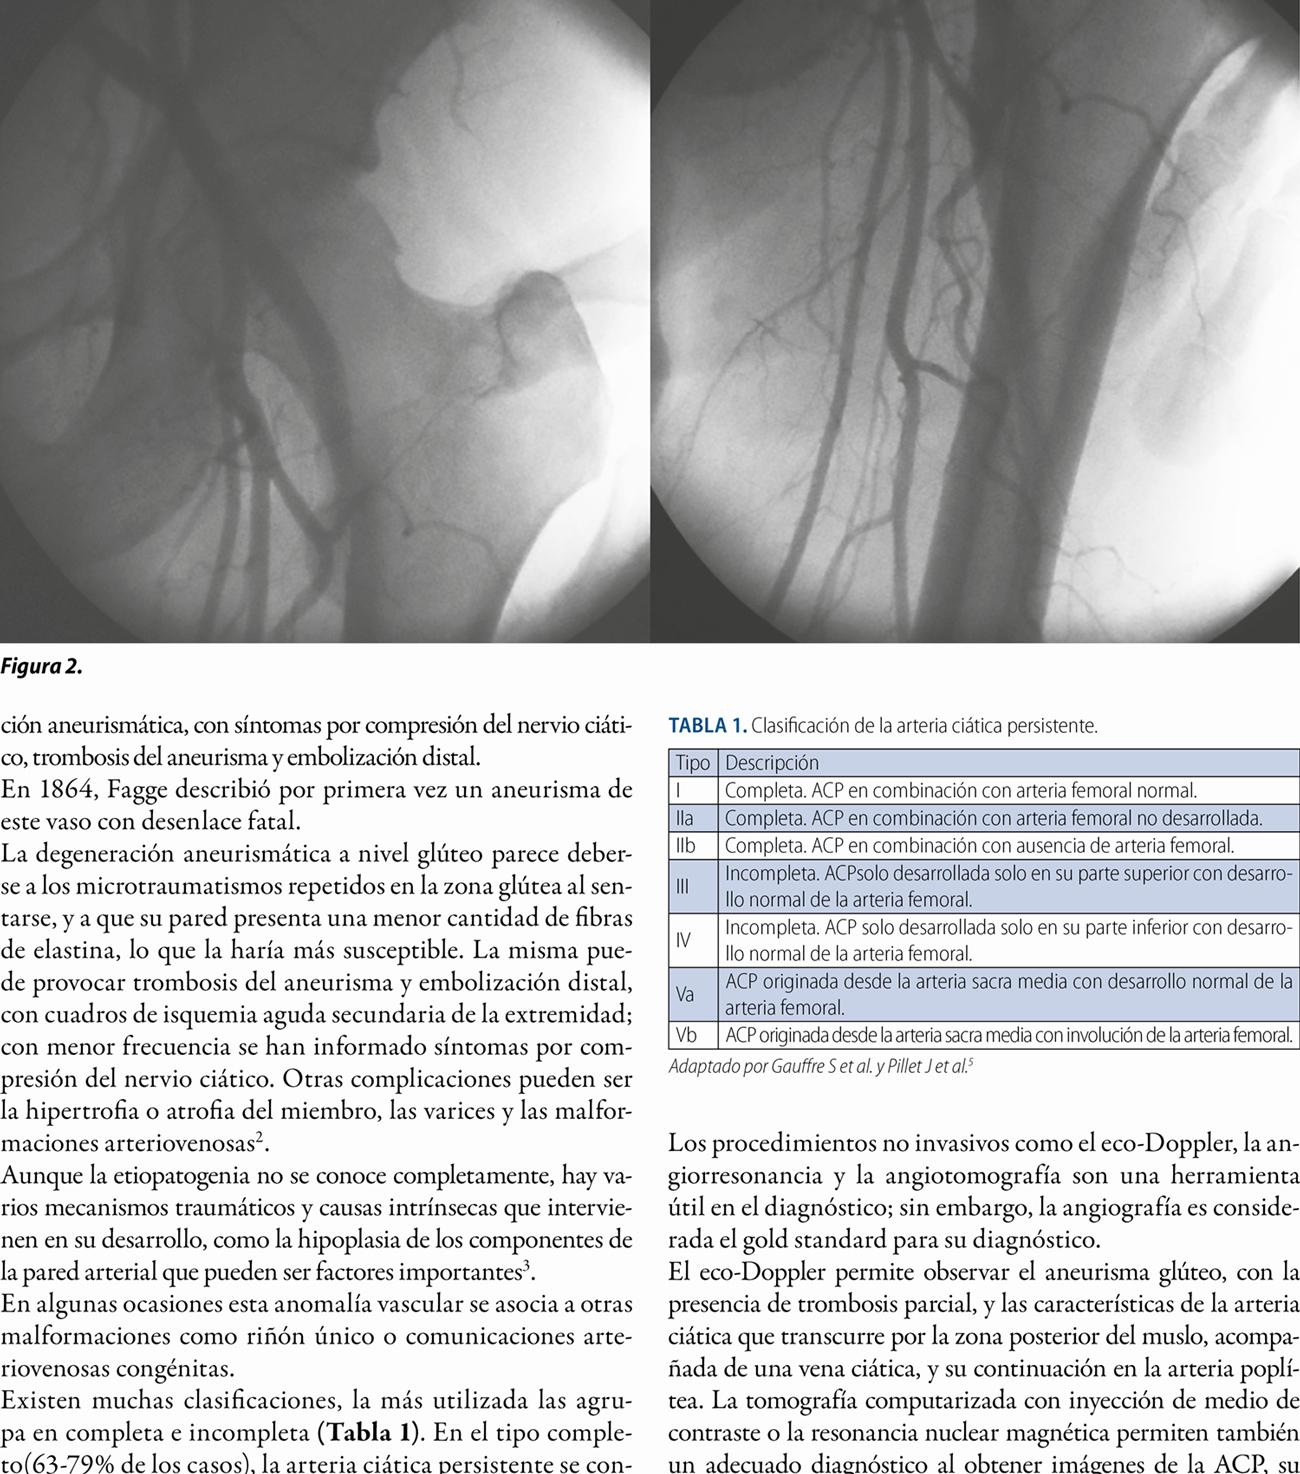 Arteria ciática persistente